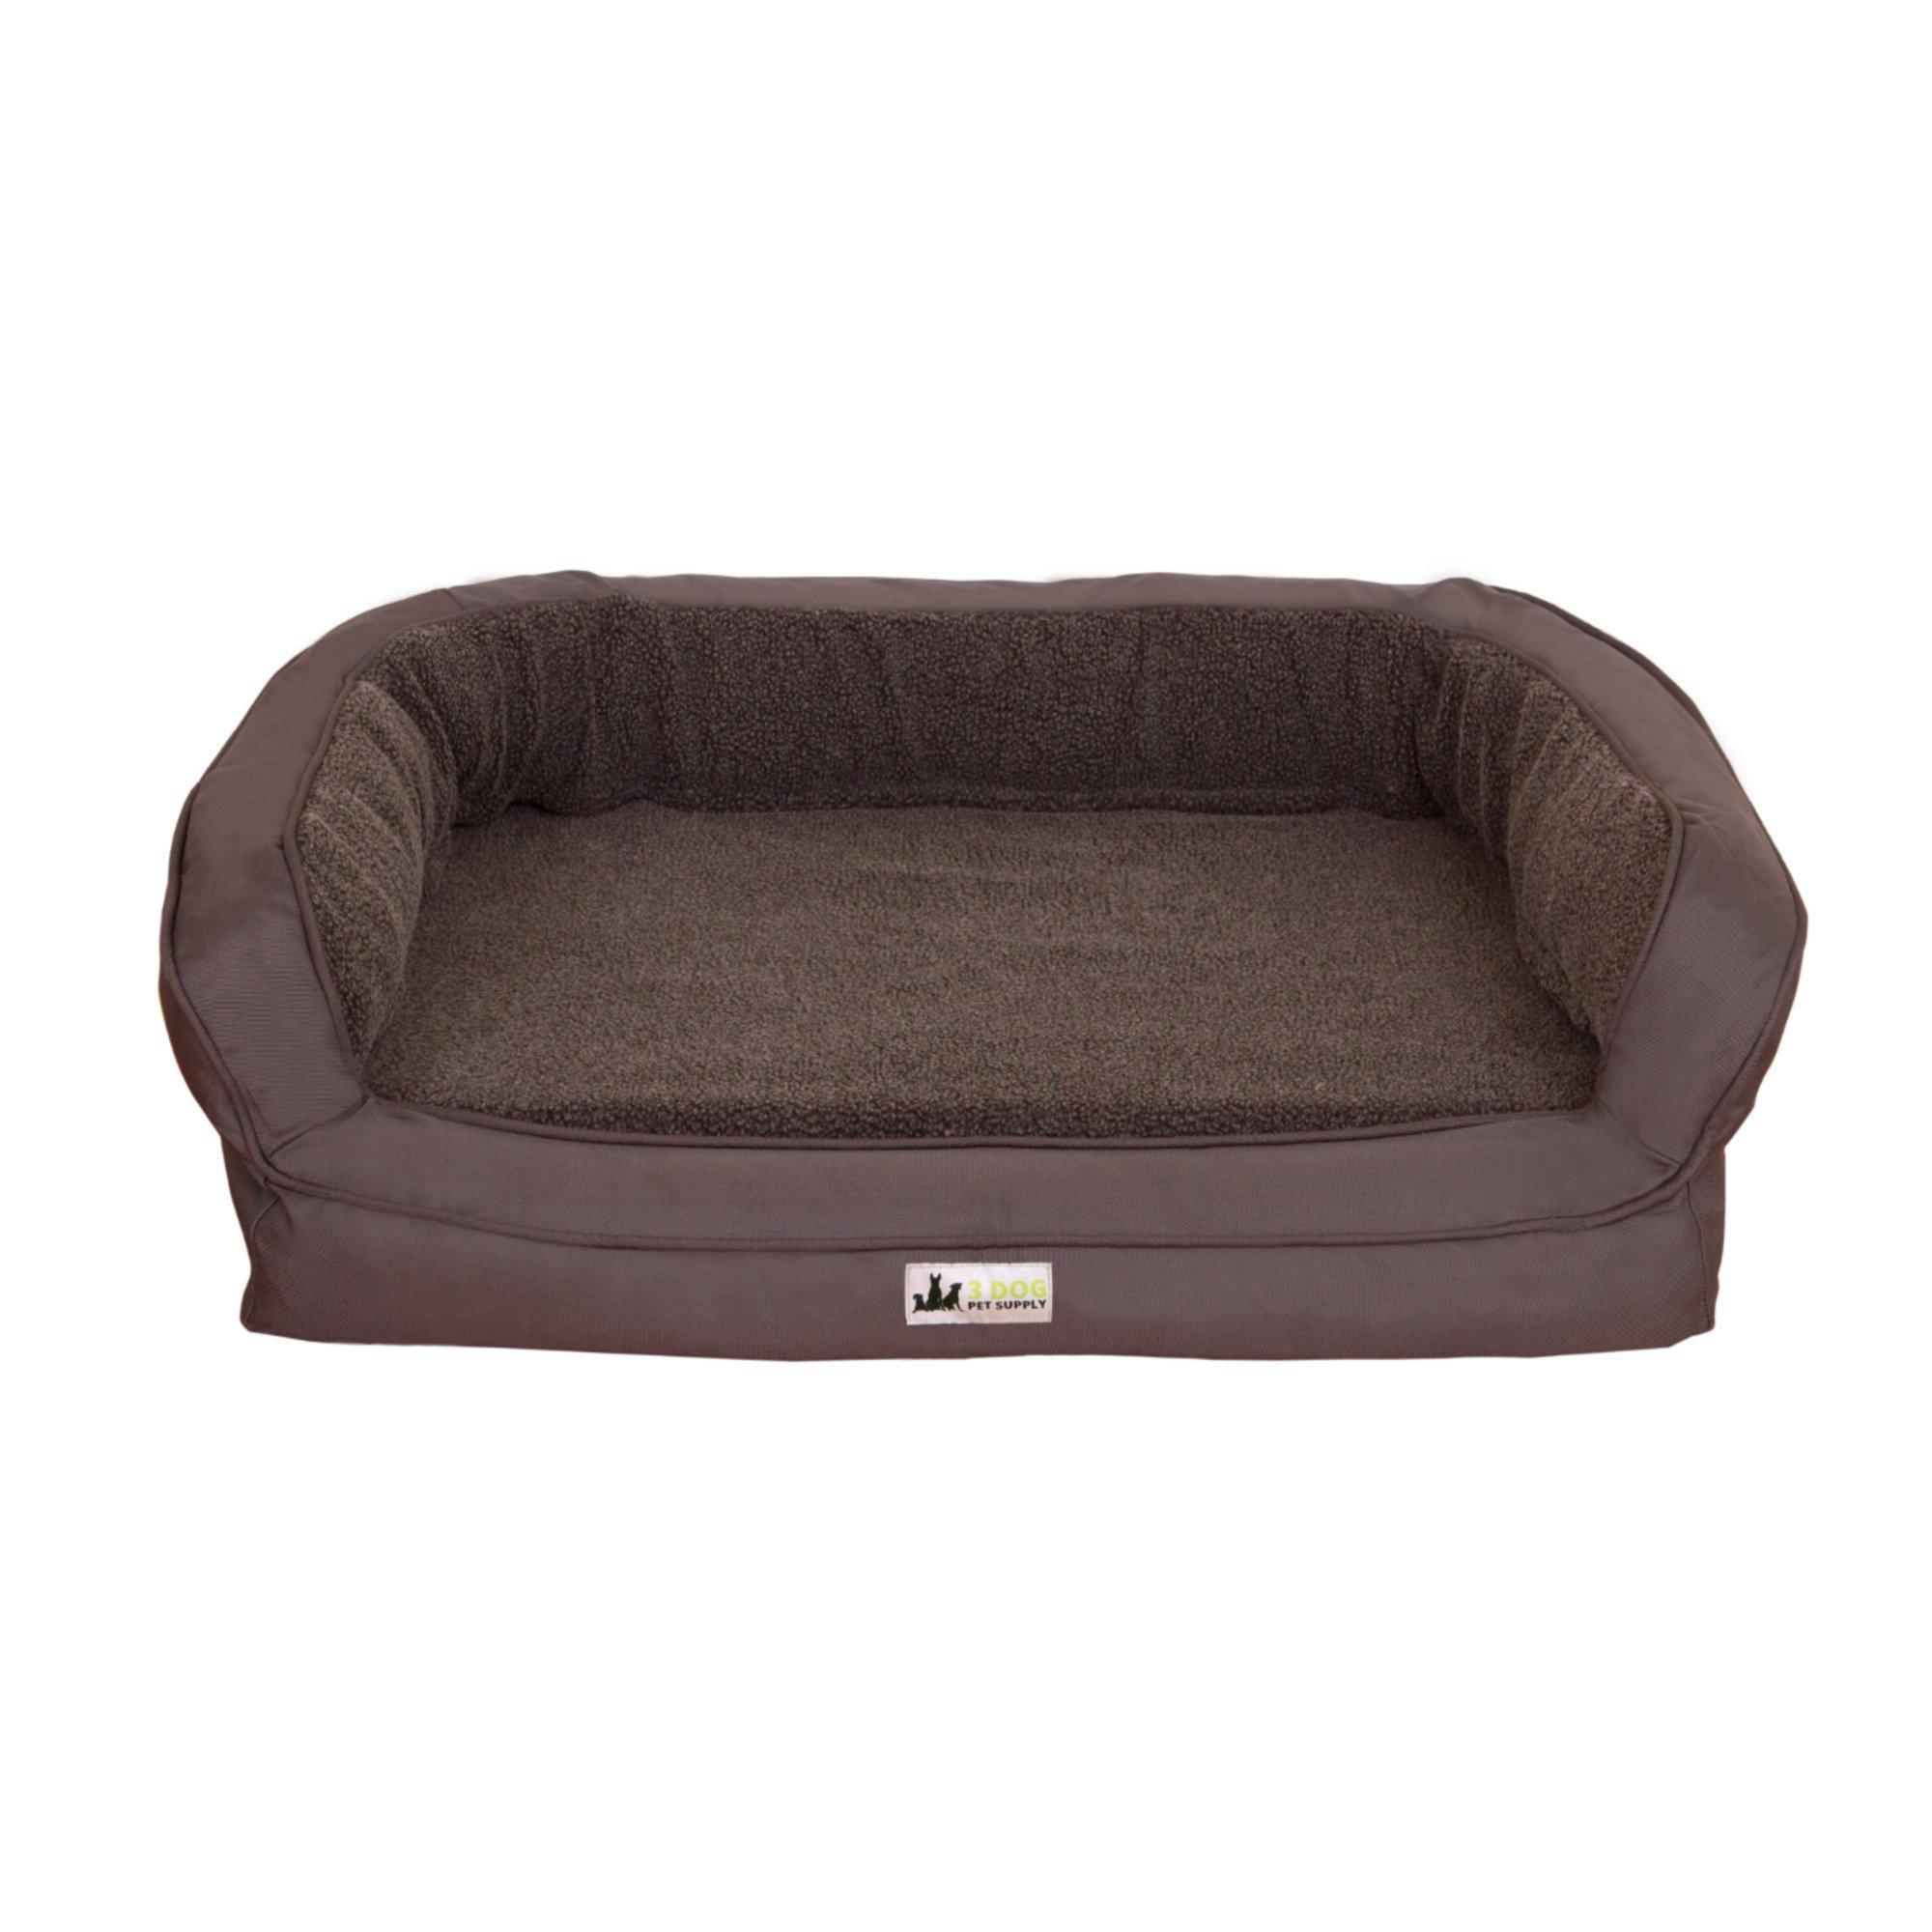 "3 Dog EZ Wash Fleece Bolster Grey Dog Bed, 48"" L X 31"" W X 10"" H, Large"